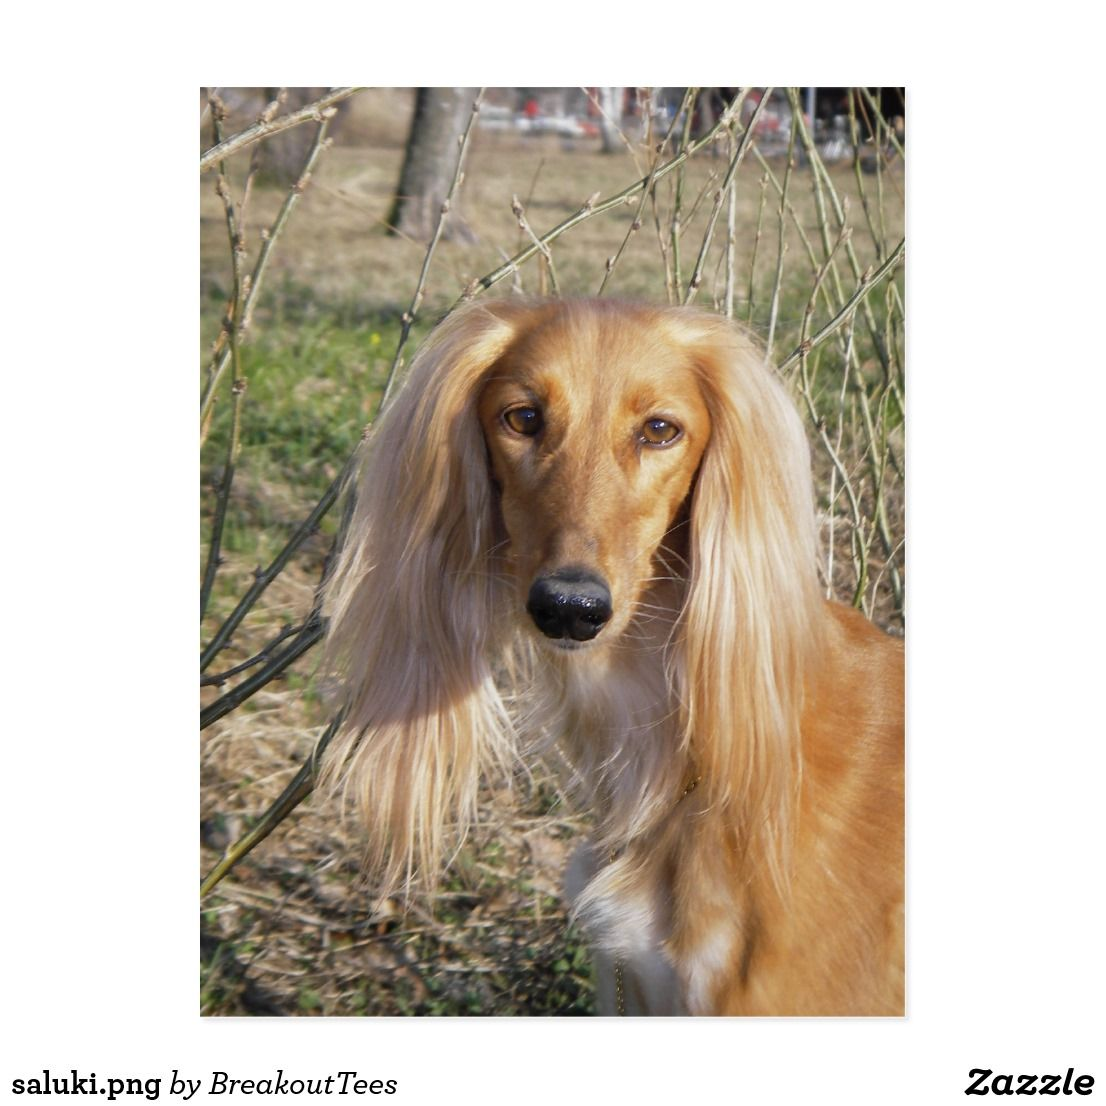 Saluki Png Postcard Zazzle Com Dogs Dog Pictures Dog Breeds